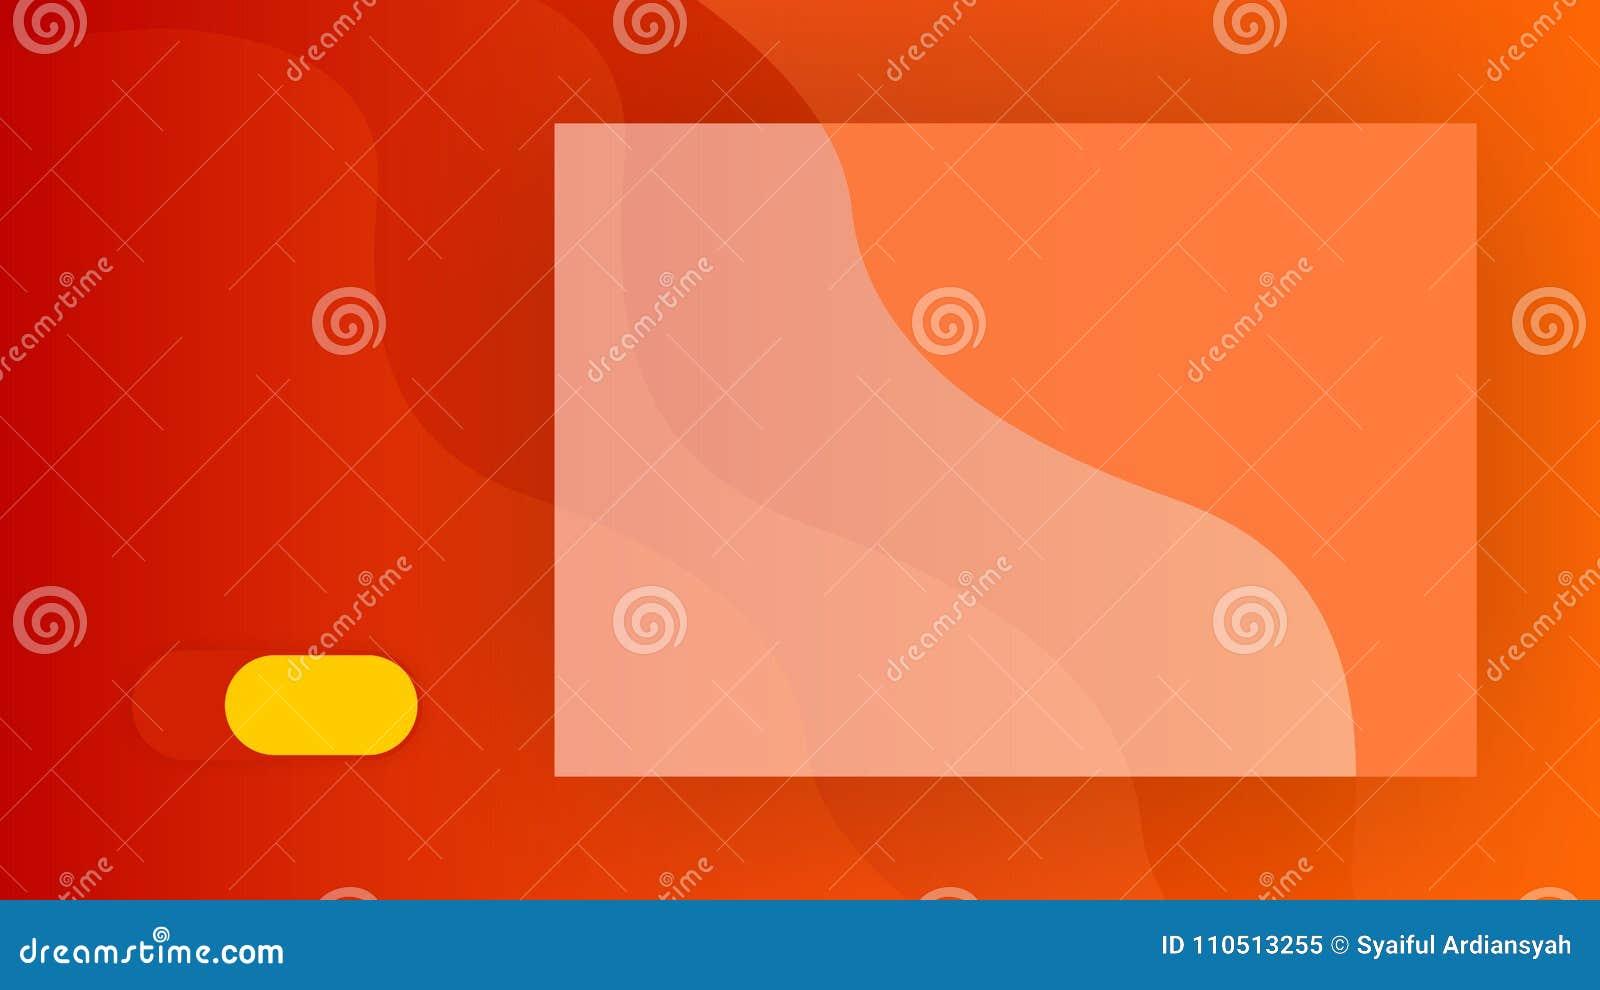 fondo abstracto anaranjado para powerpoint